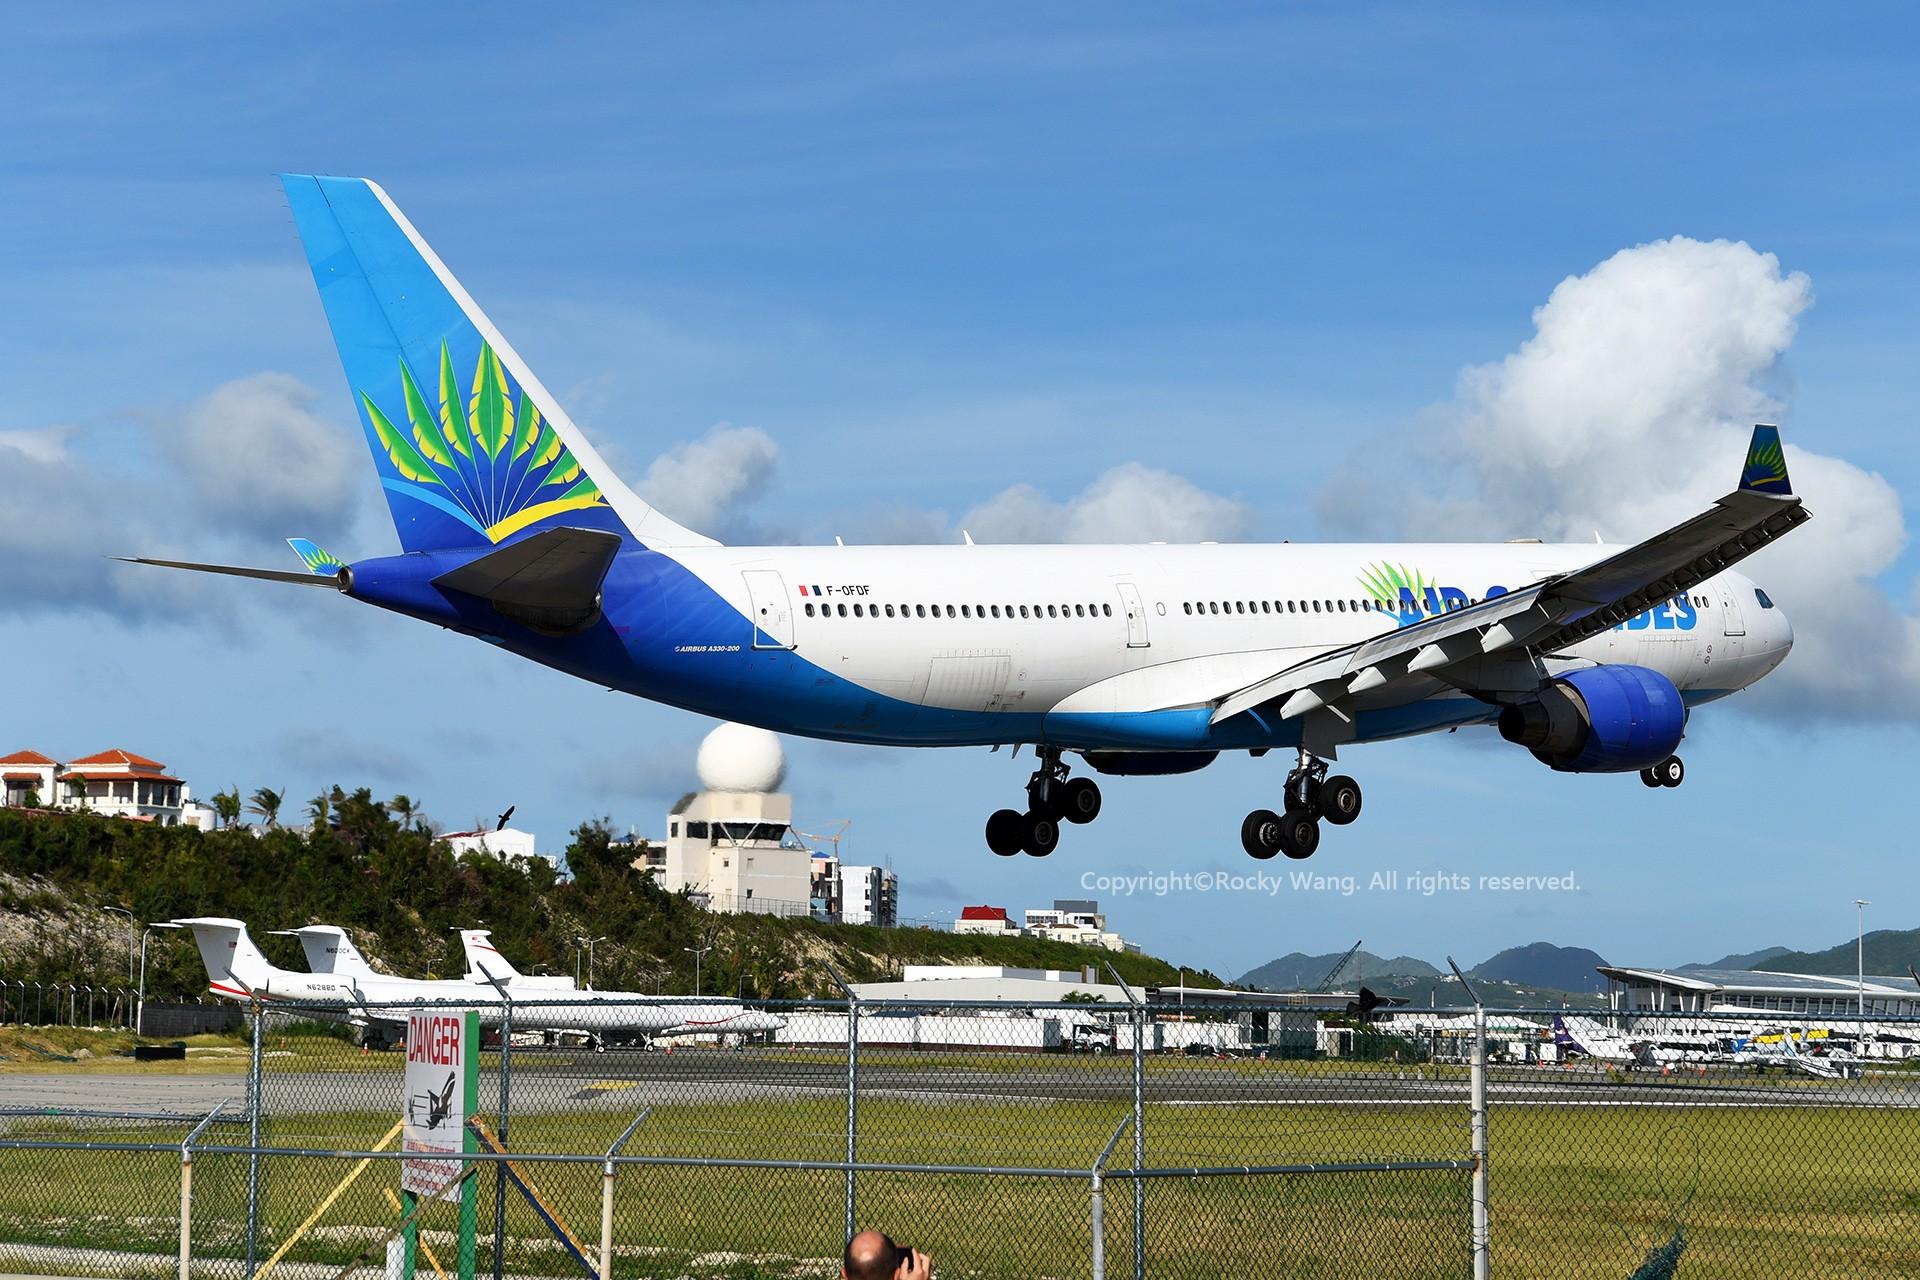 Re:[原创]A330s Around the World AIRBUS A330-223 F-OFDF 荷属安的列斯群岛朱利安娜公主机场